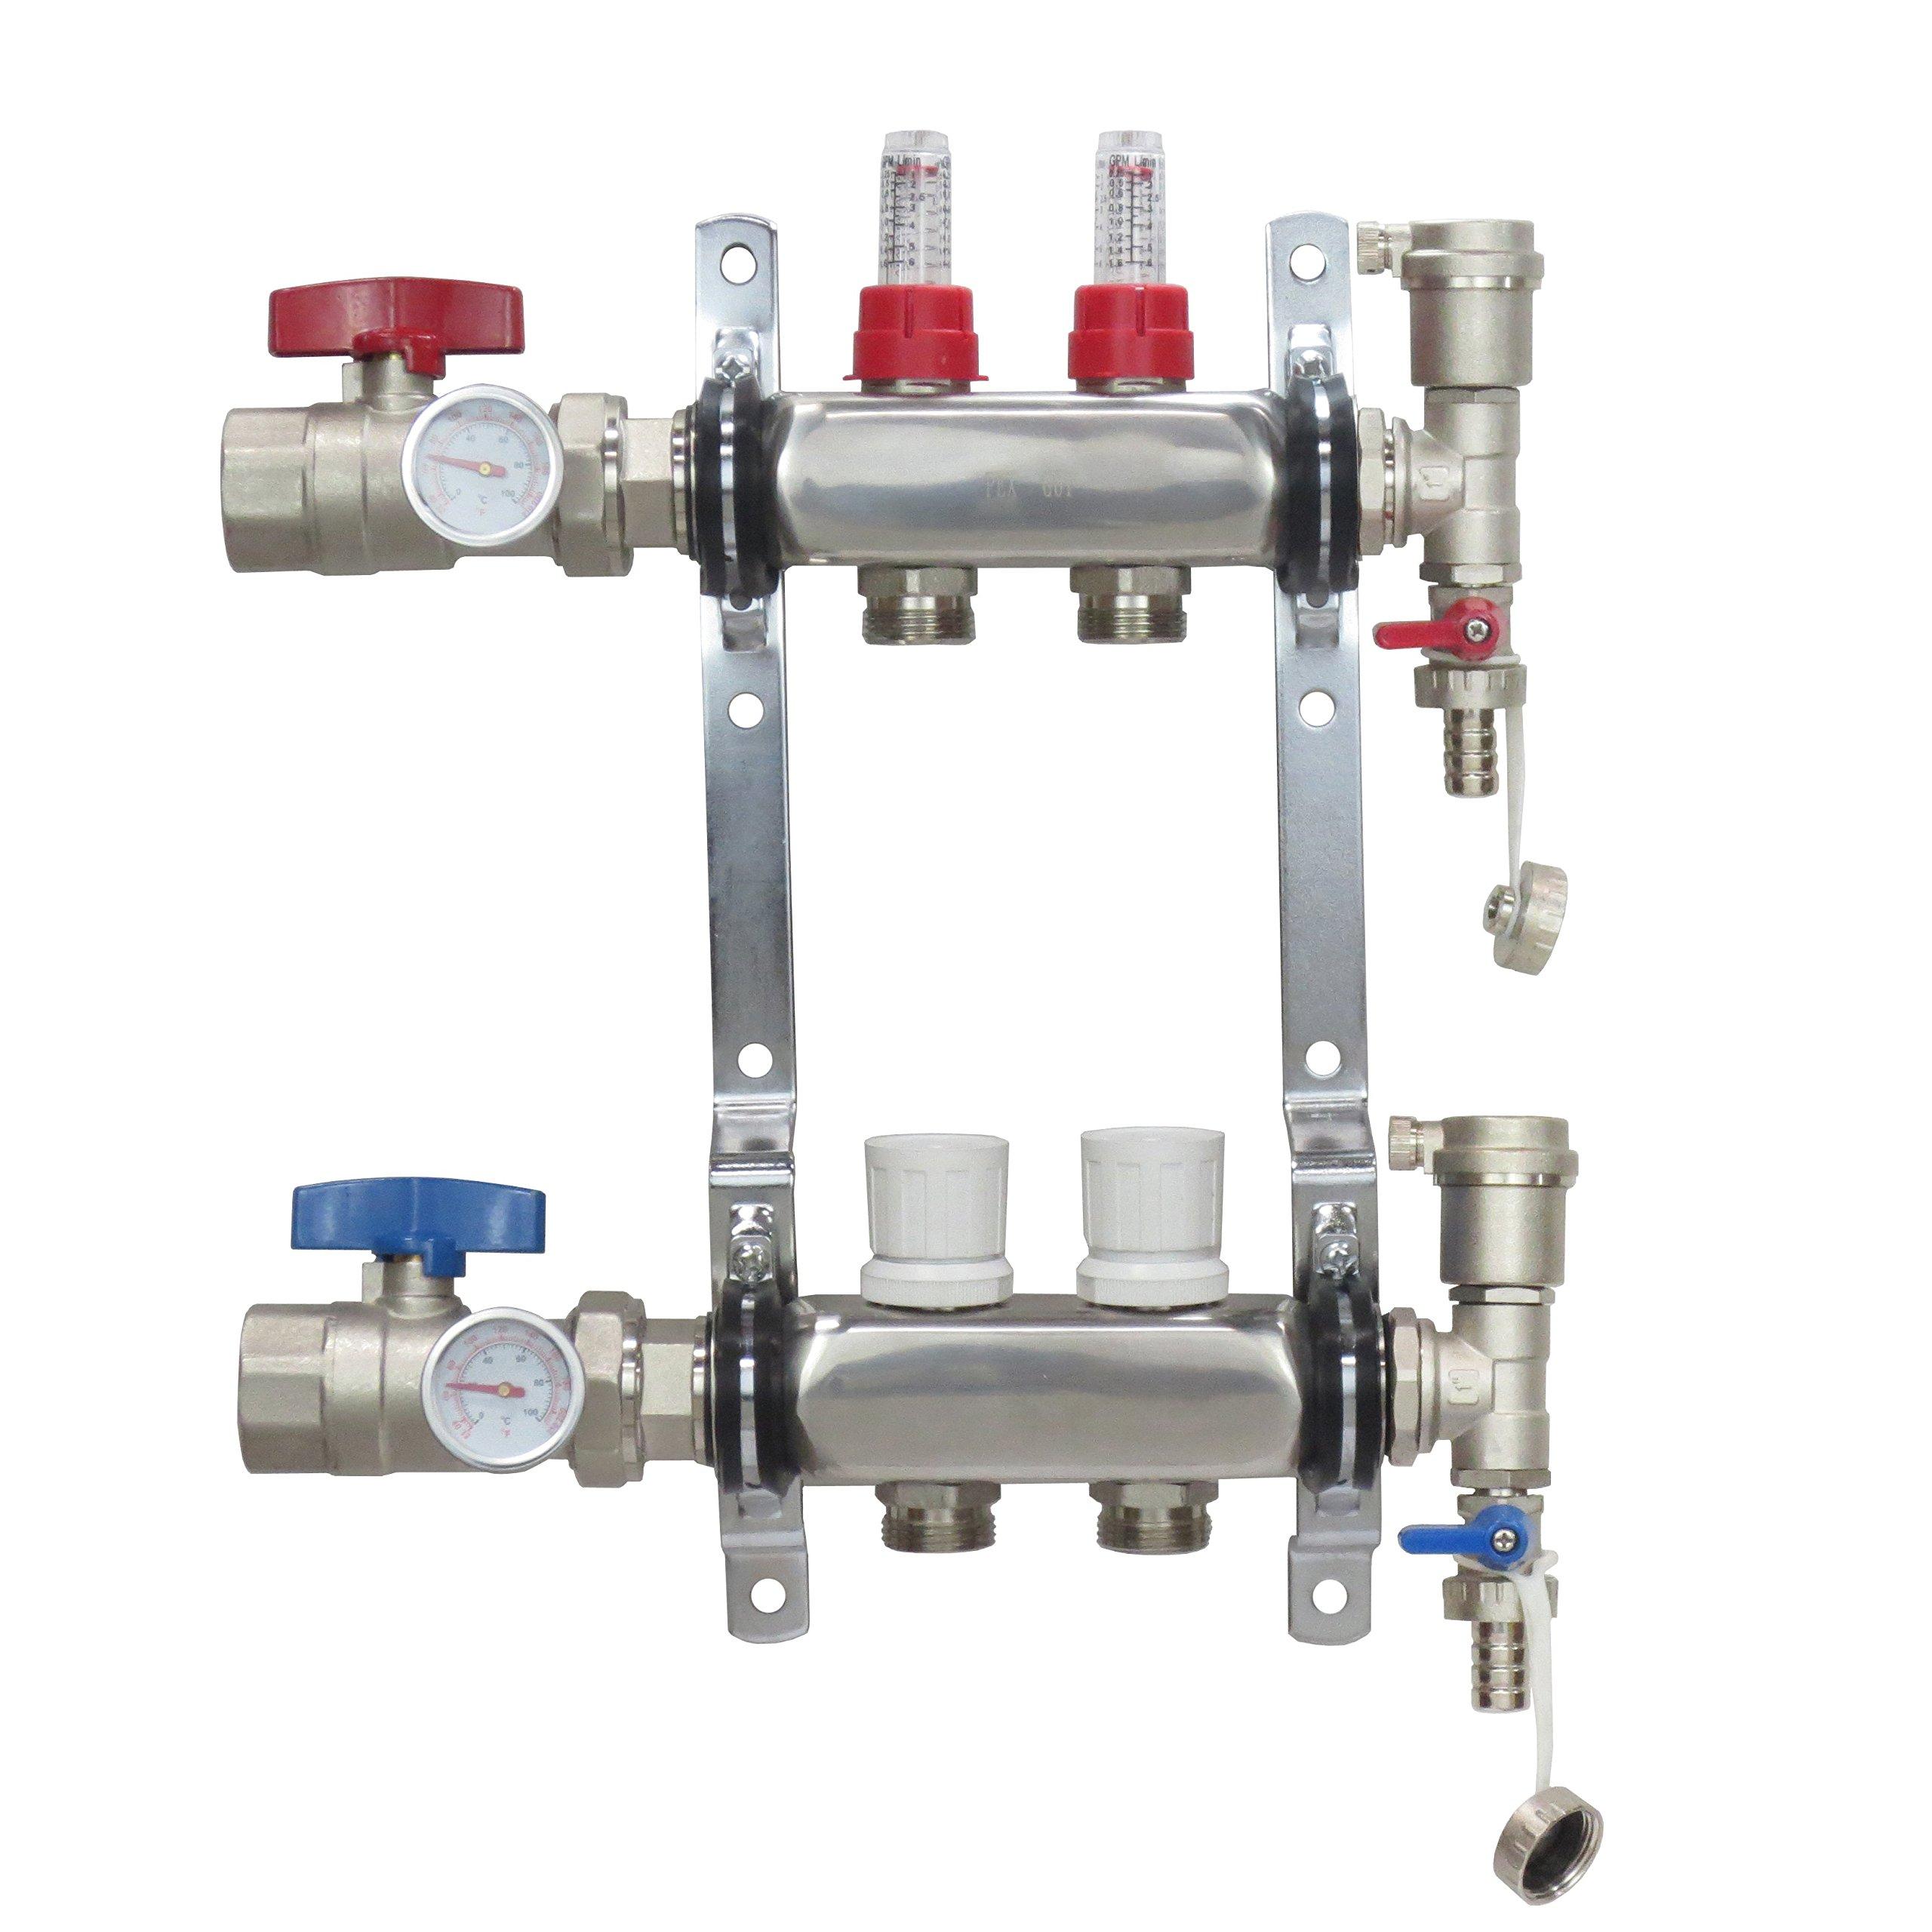 2 Loop Stainless Steel Premium PEX Manifold With 1/2'' Connectors for Radiant Heating - PEX GUY (2 Loops)